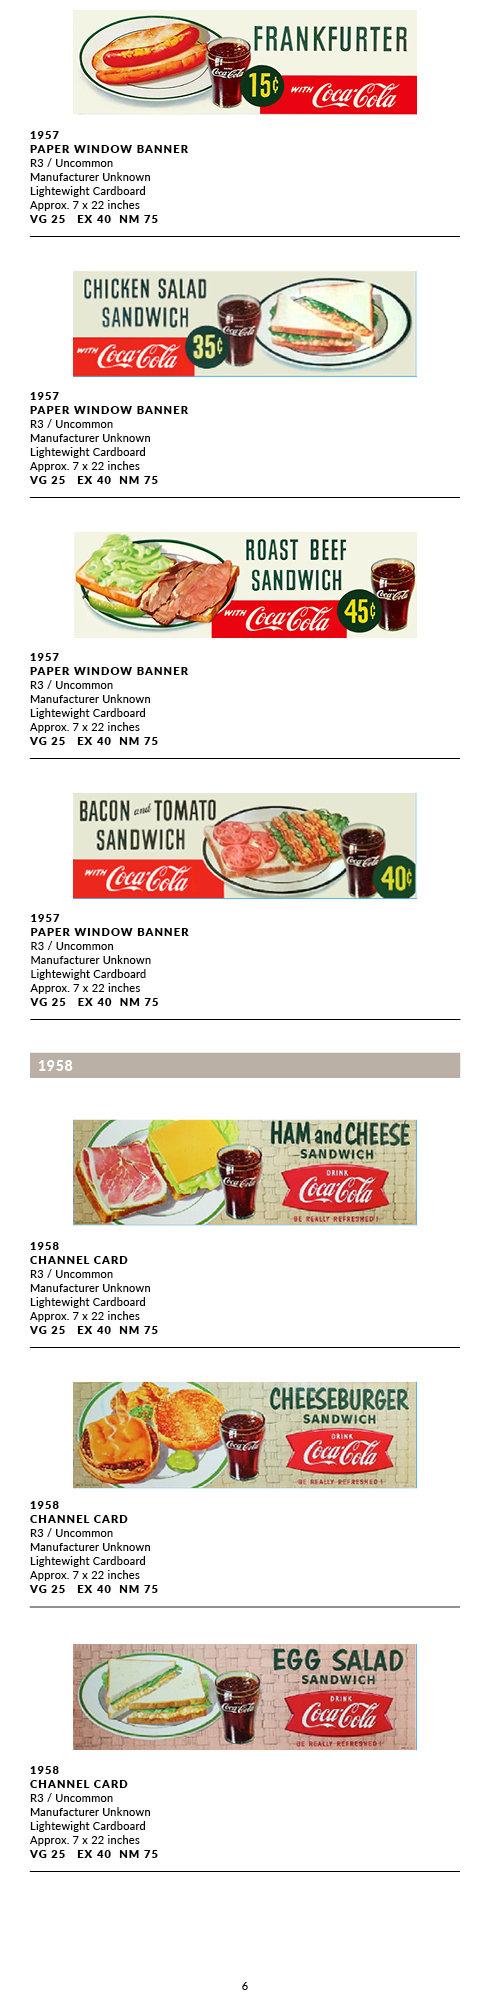 Food Channel Card6.jpg